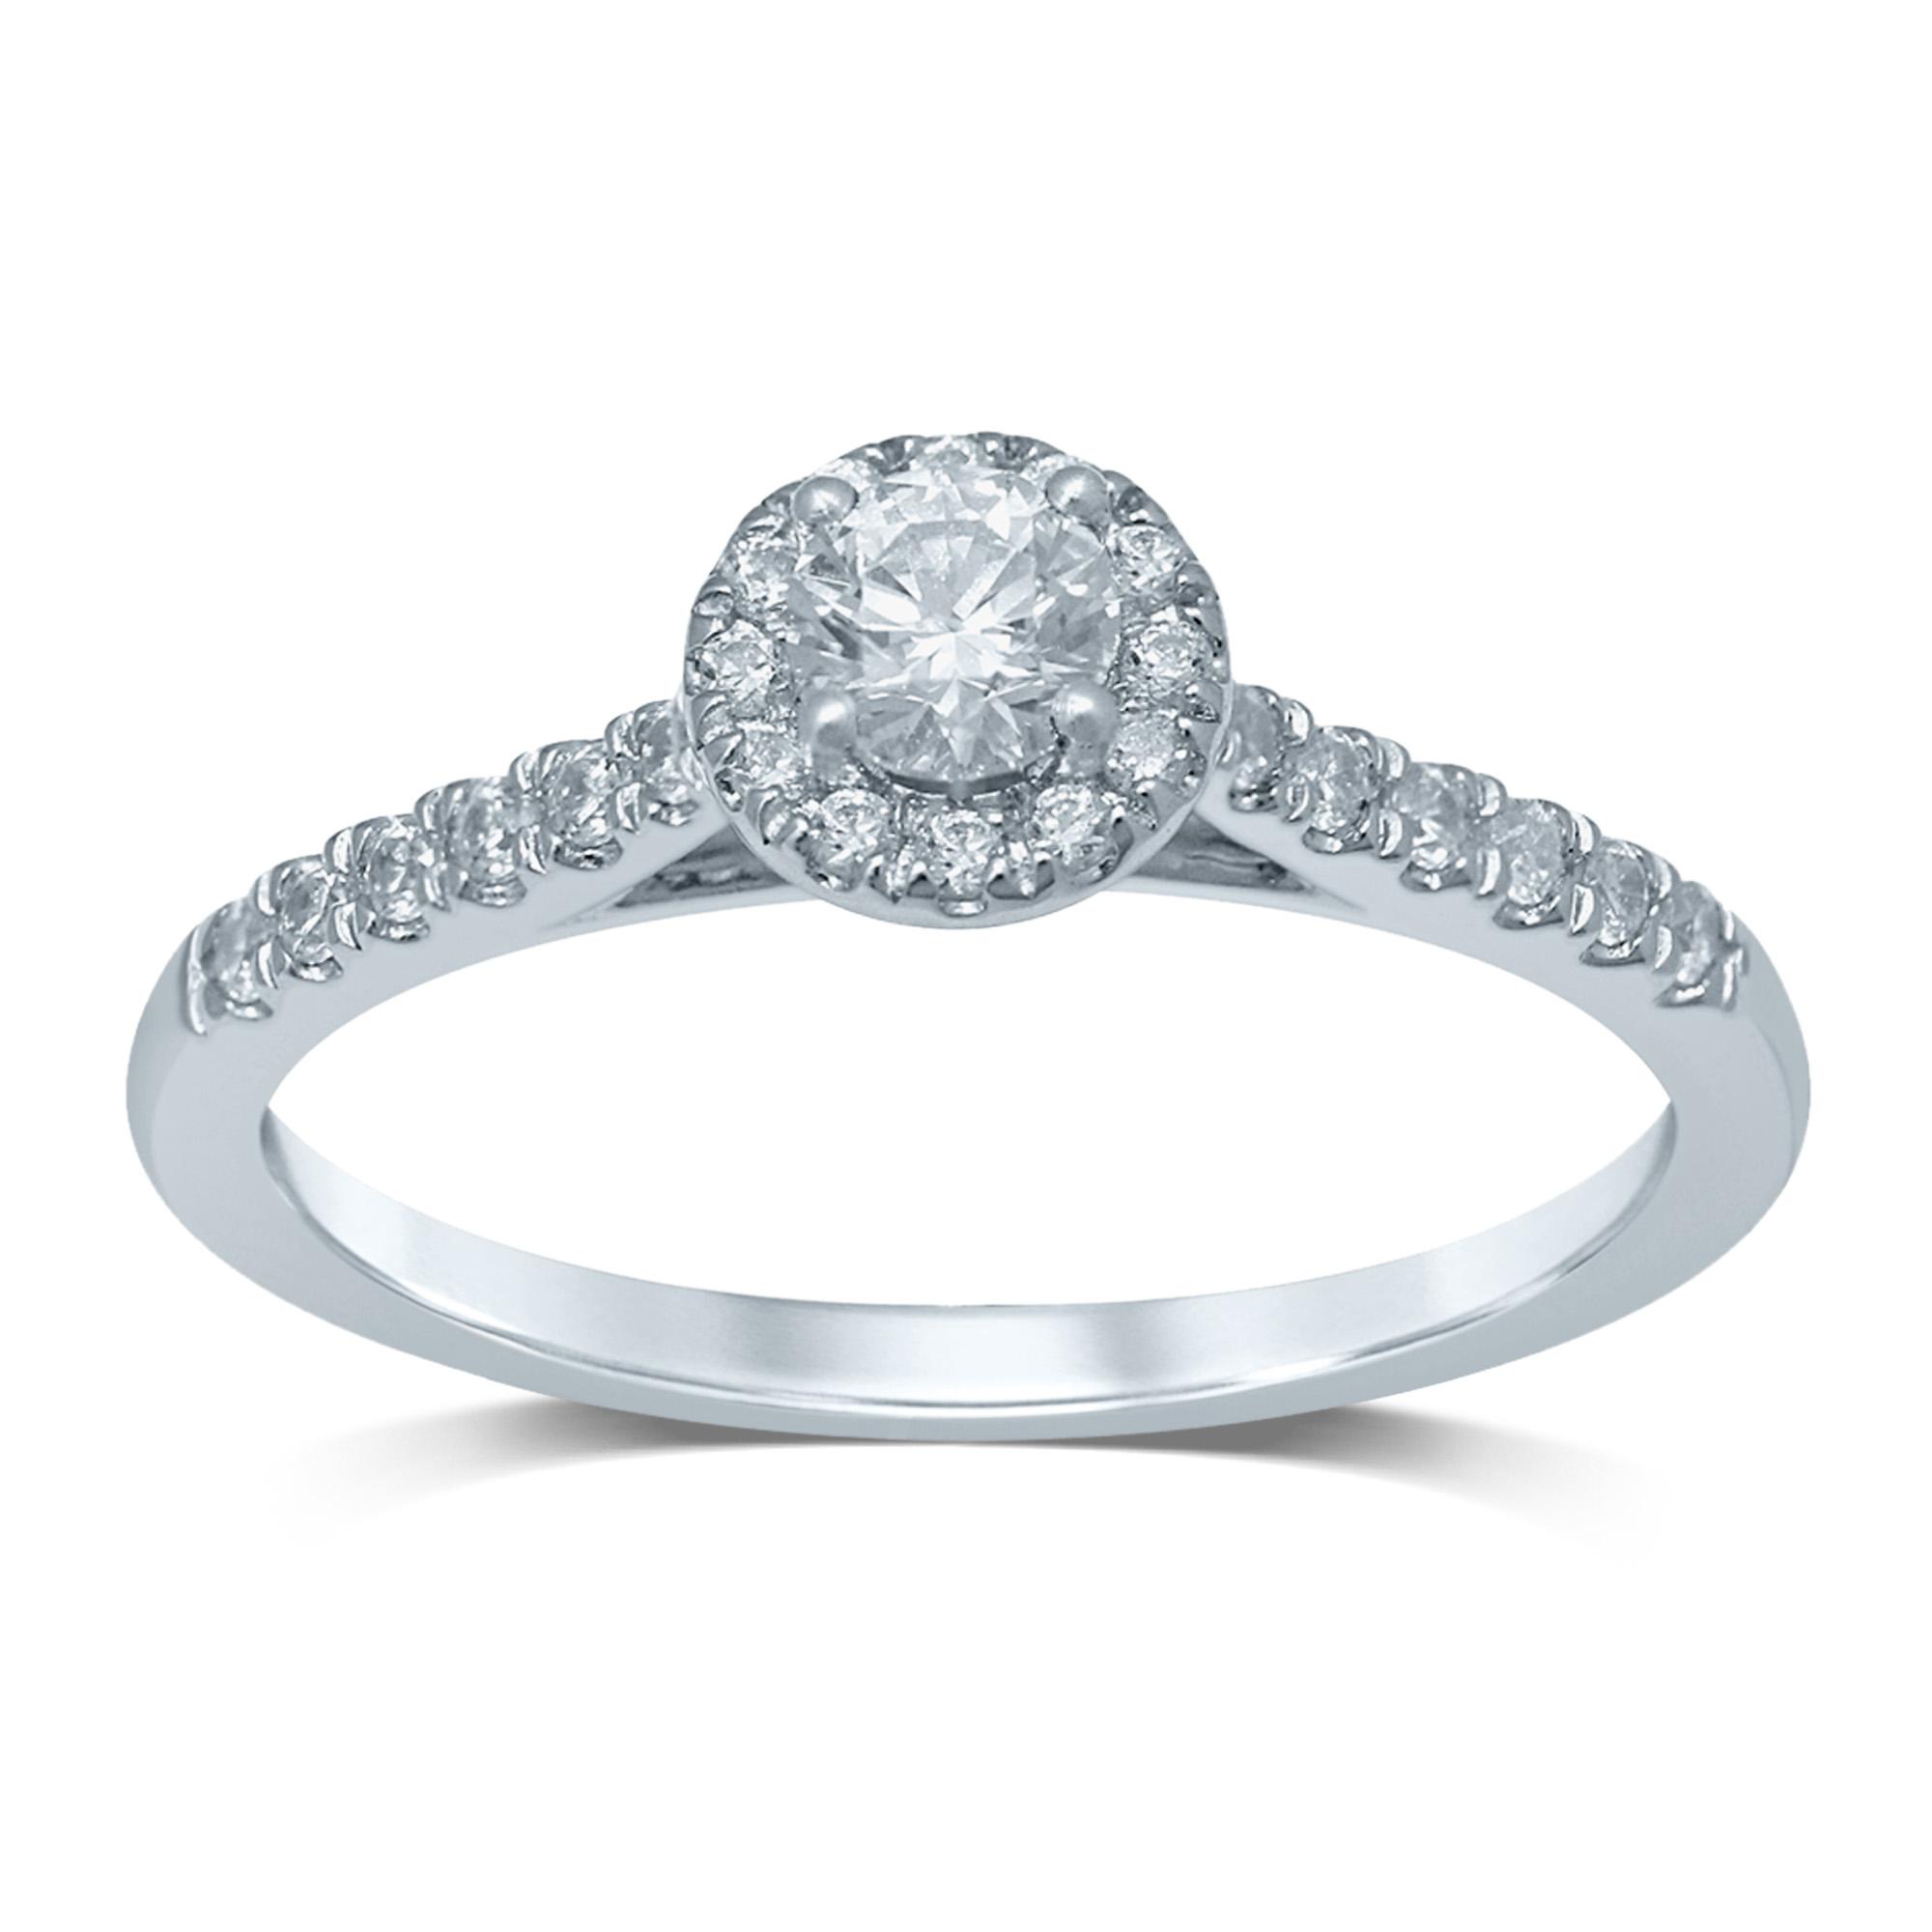 18ct White Gold 0.45 Carat Brilliant Diamond Halo Ring